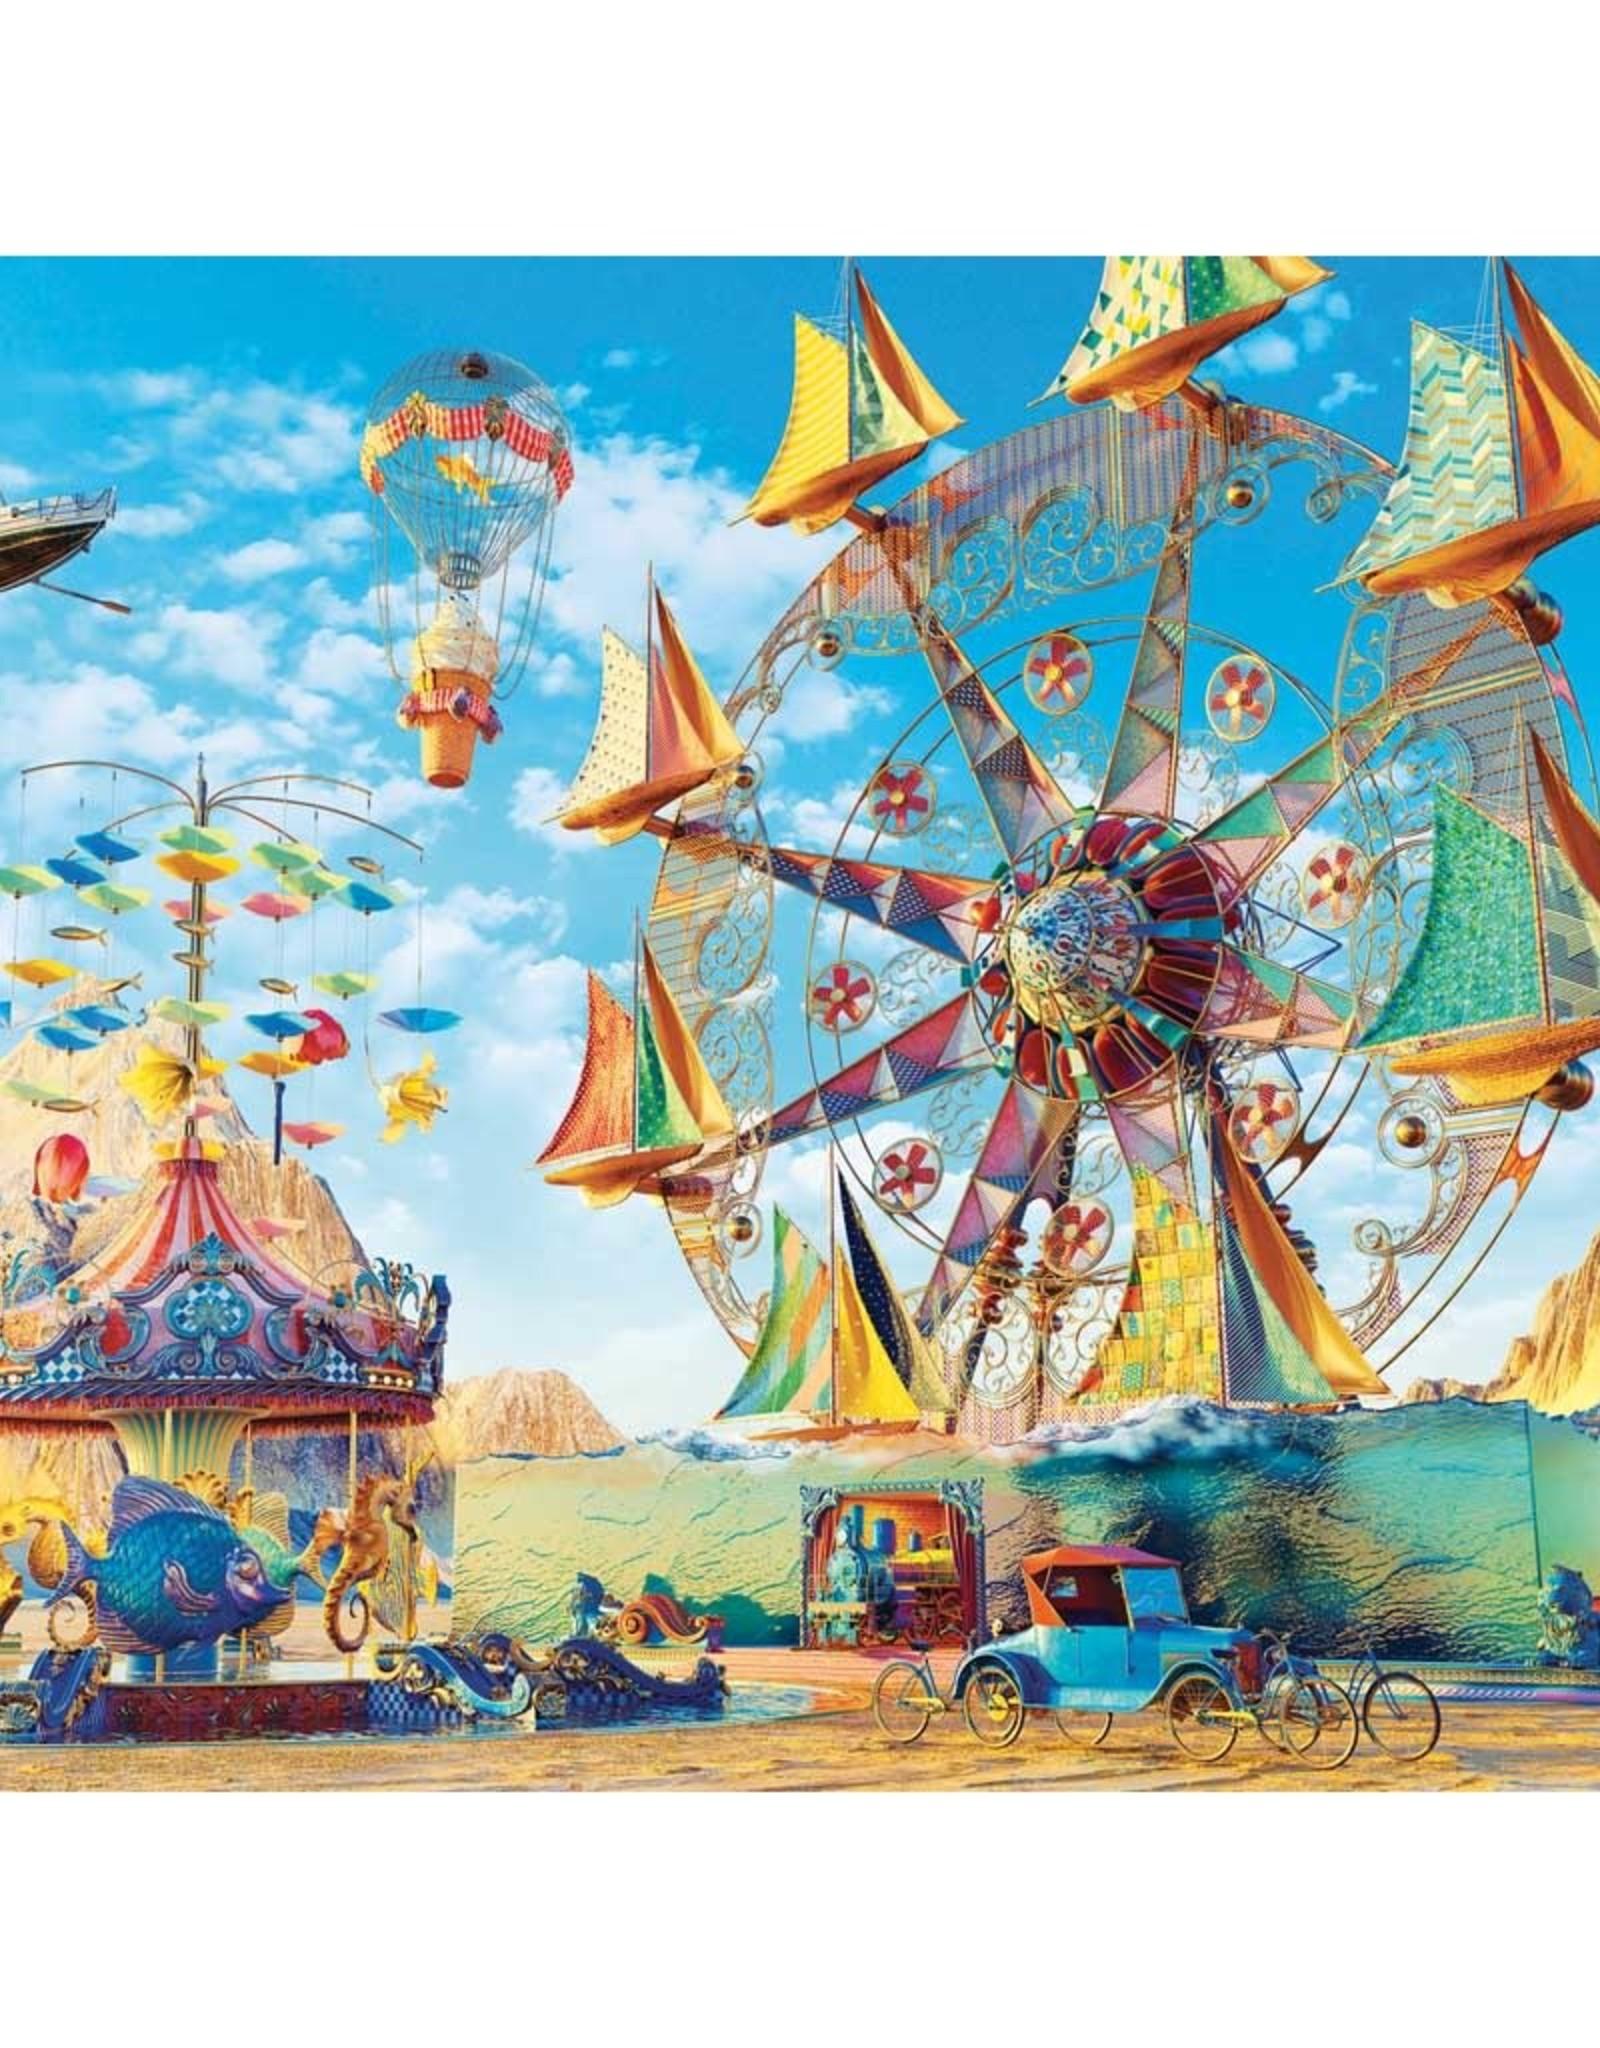 Ravensburger 1500pc Carnival of Dreams